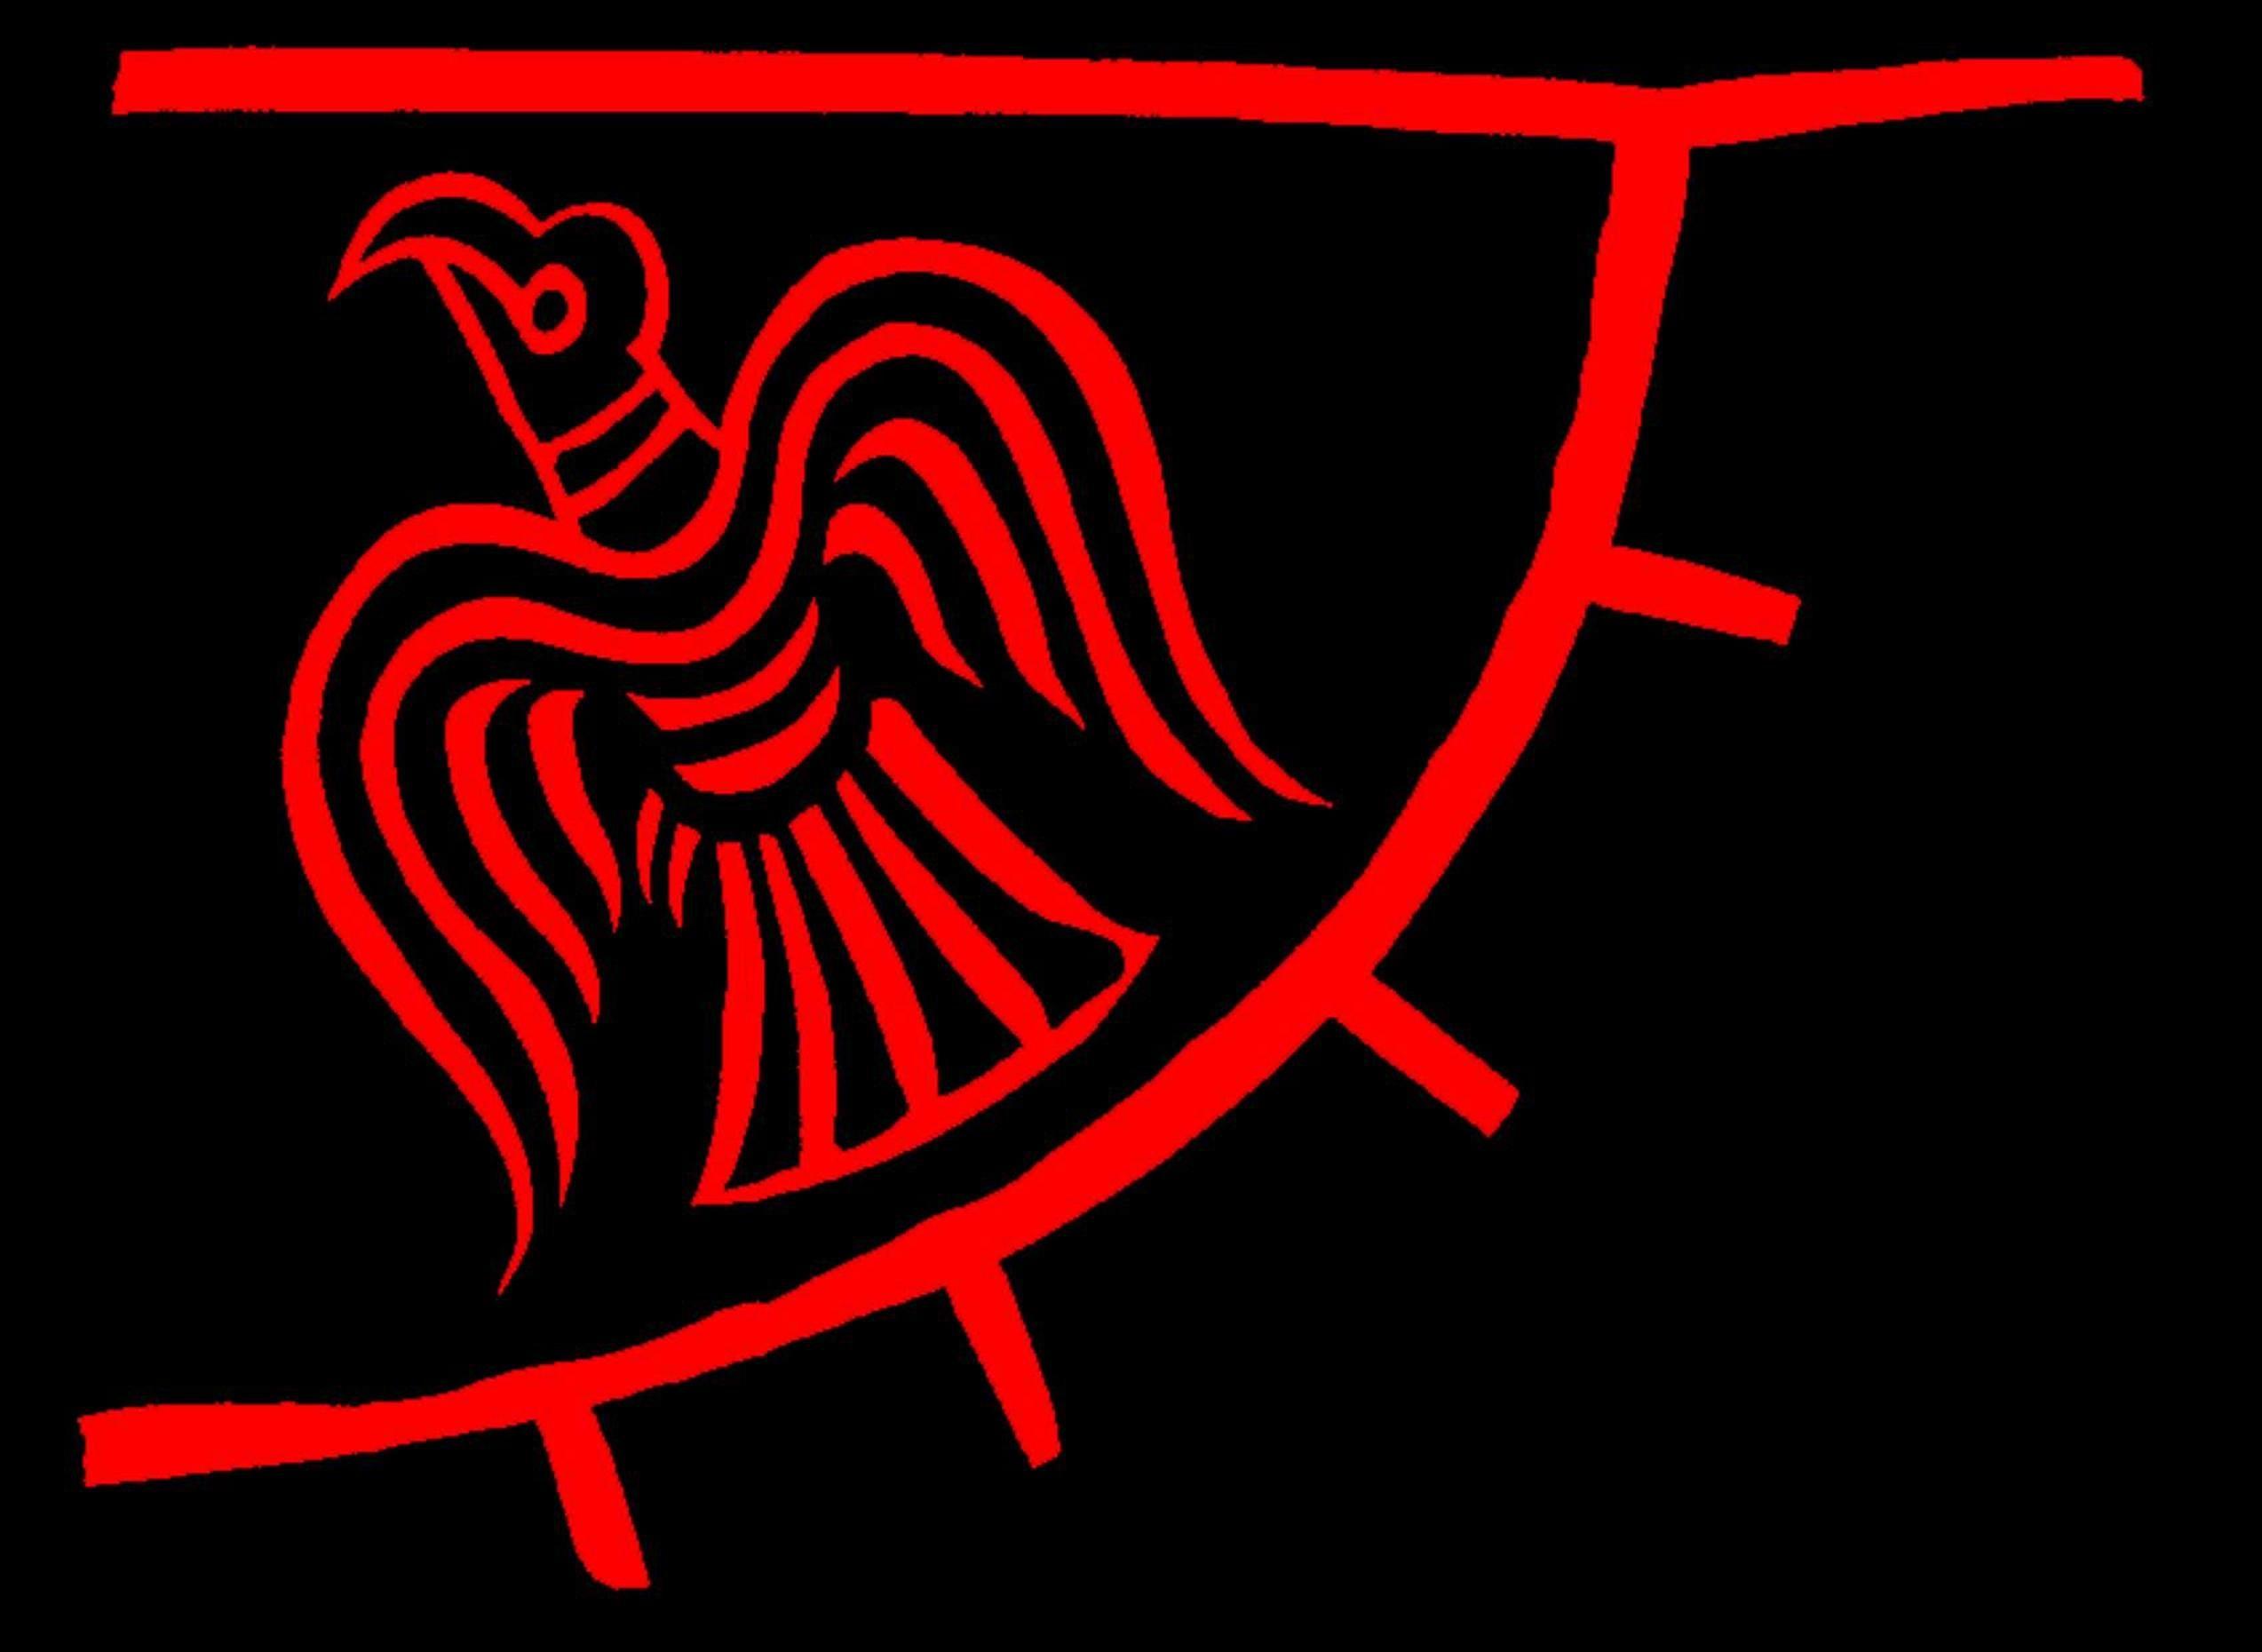 Viking Raven Flag Vikings Banner Pennant 31x36 inch Norse Pirate Ship